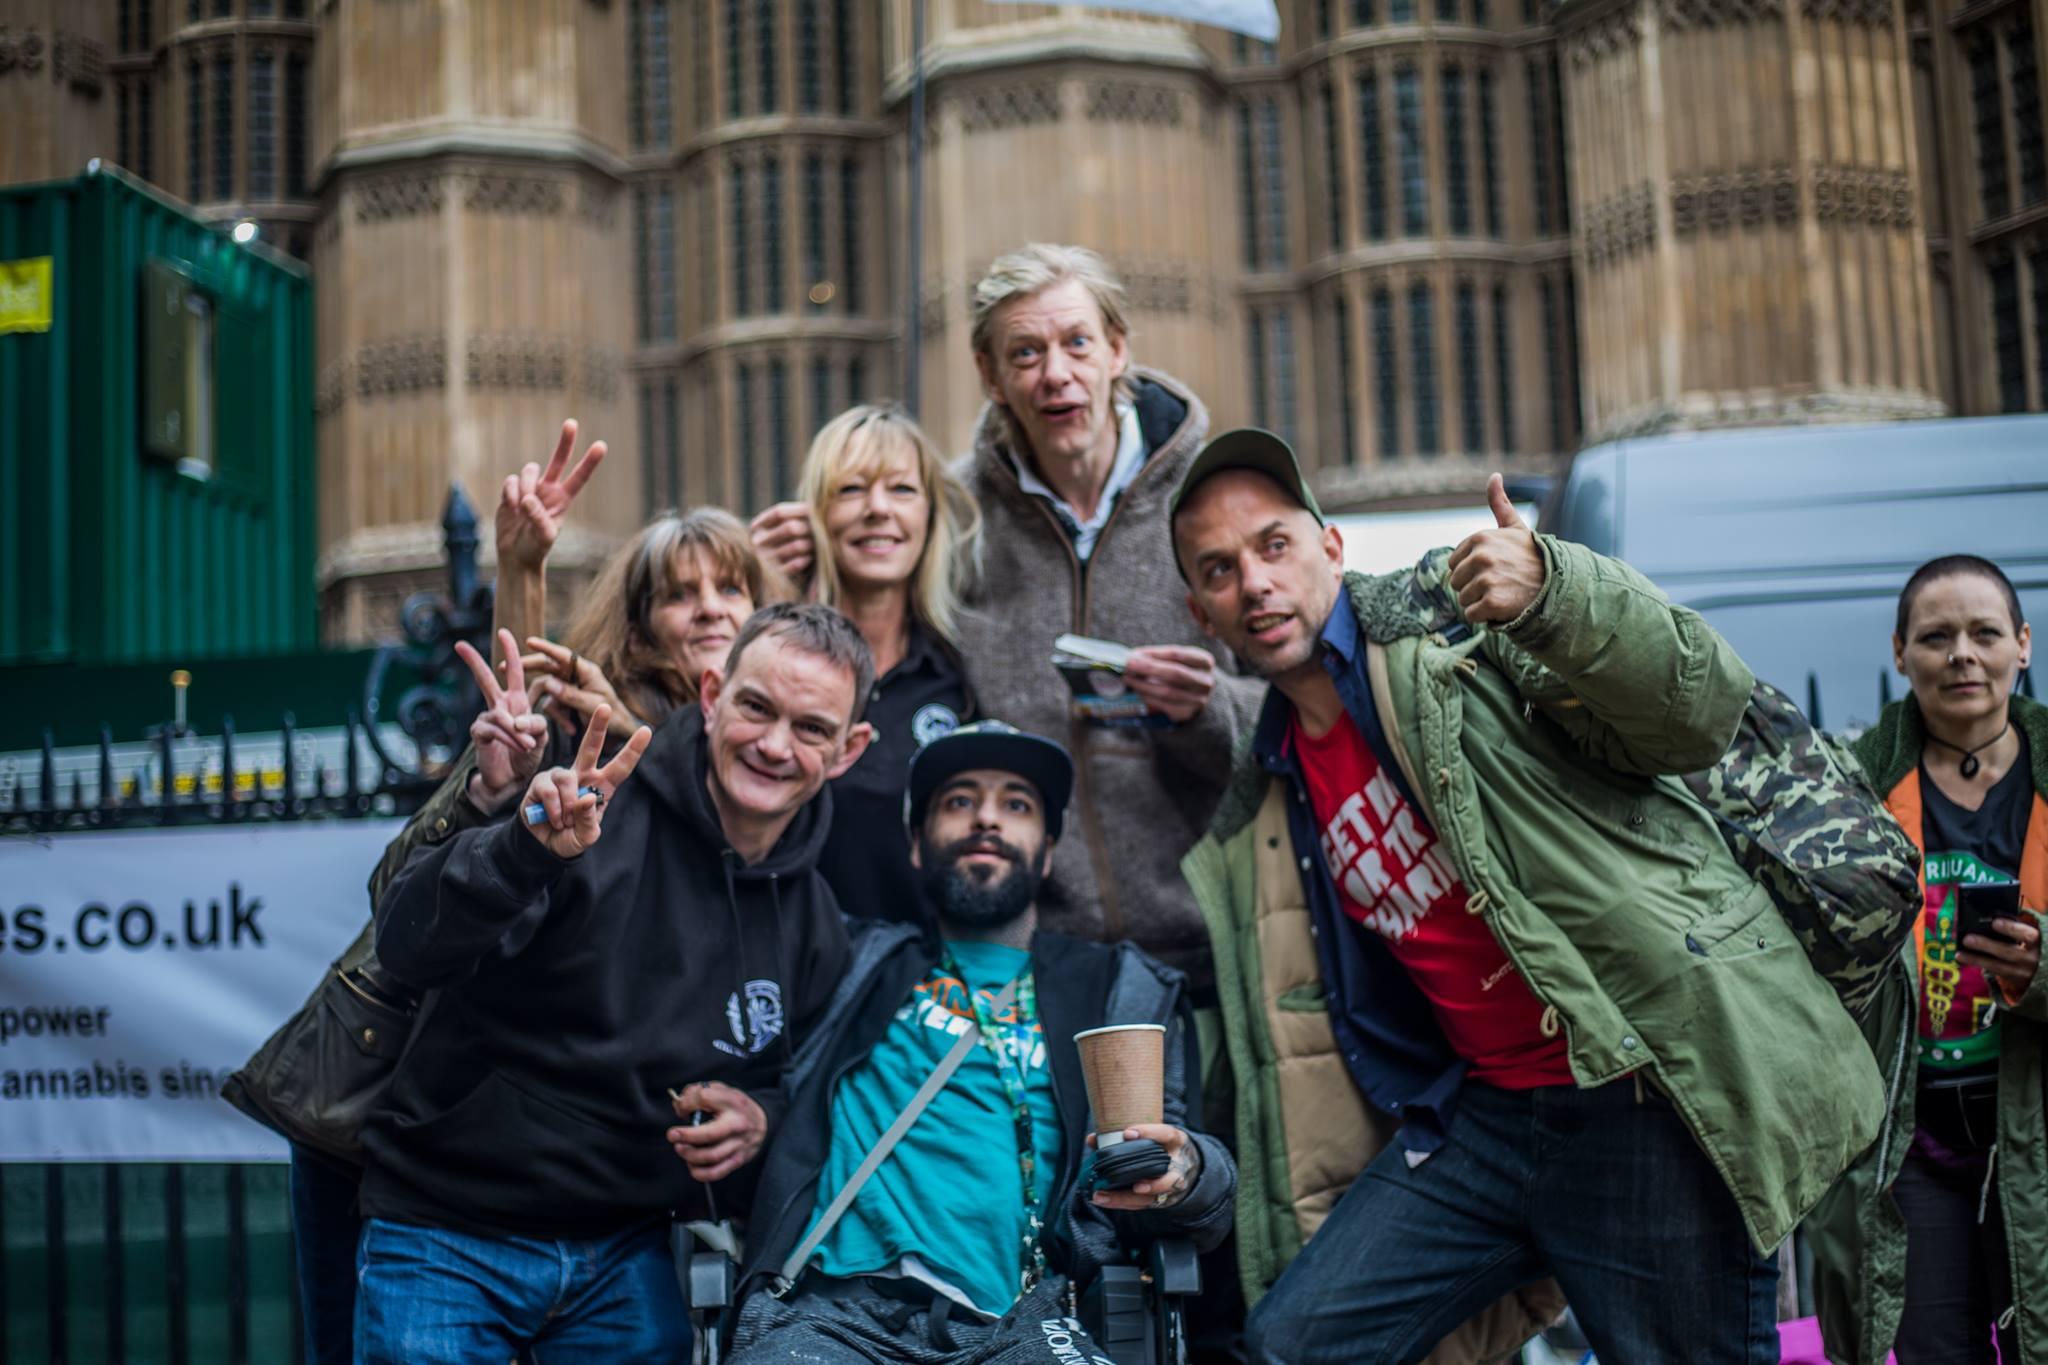 Medical Marijuana UK at Patients at Parliament London